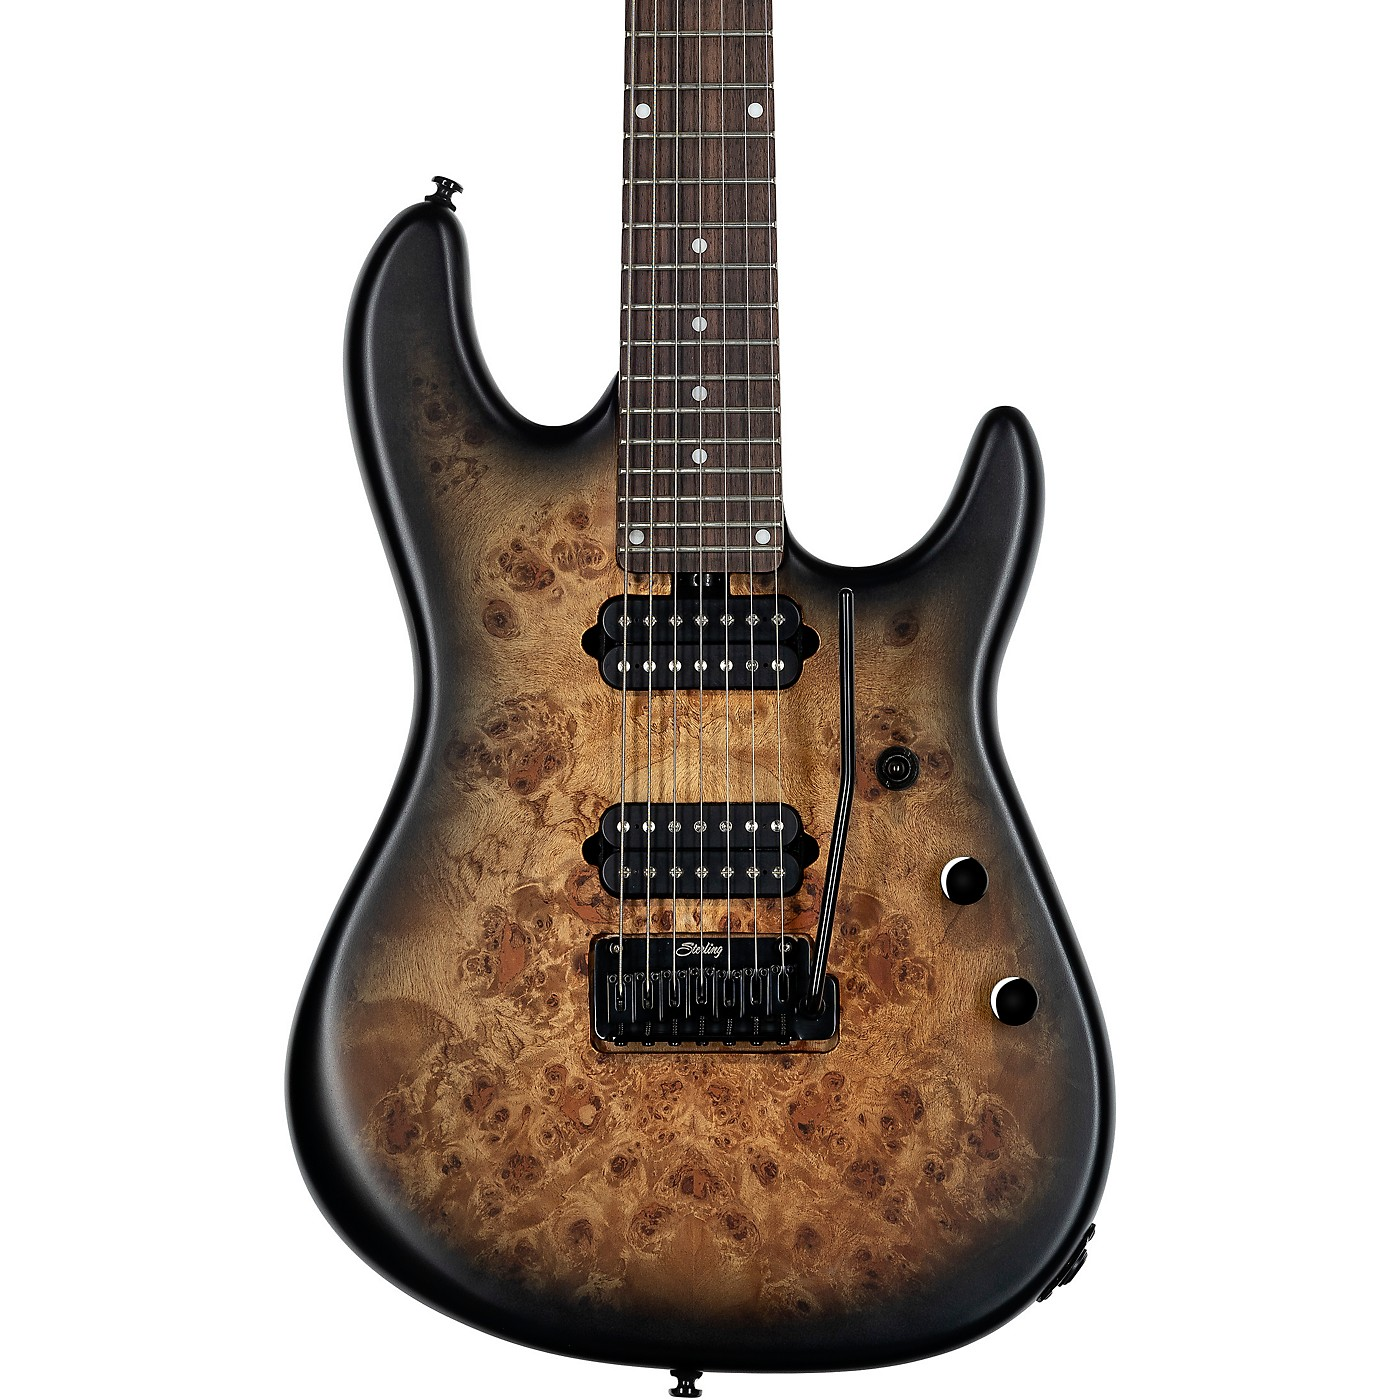 Sterling by Music Man Jason Richardson Cutlass Signature 7-String Electric Guitar thumbnail